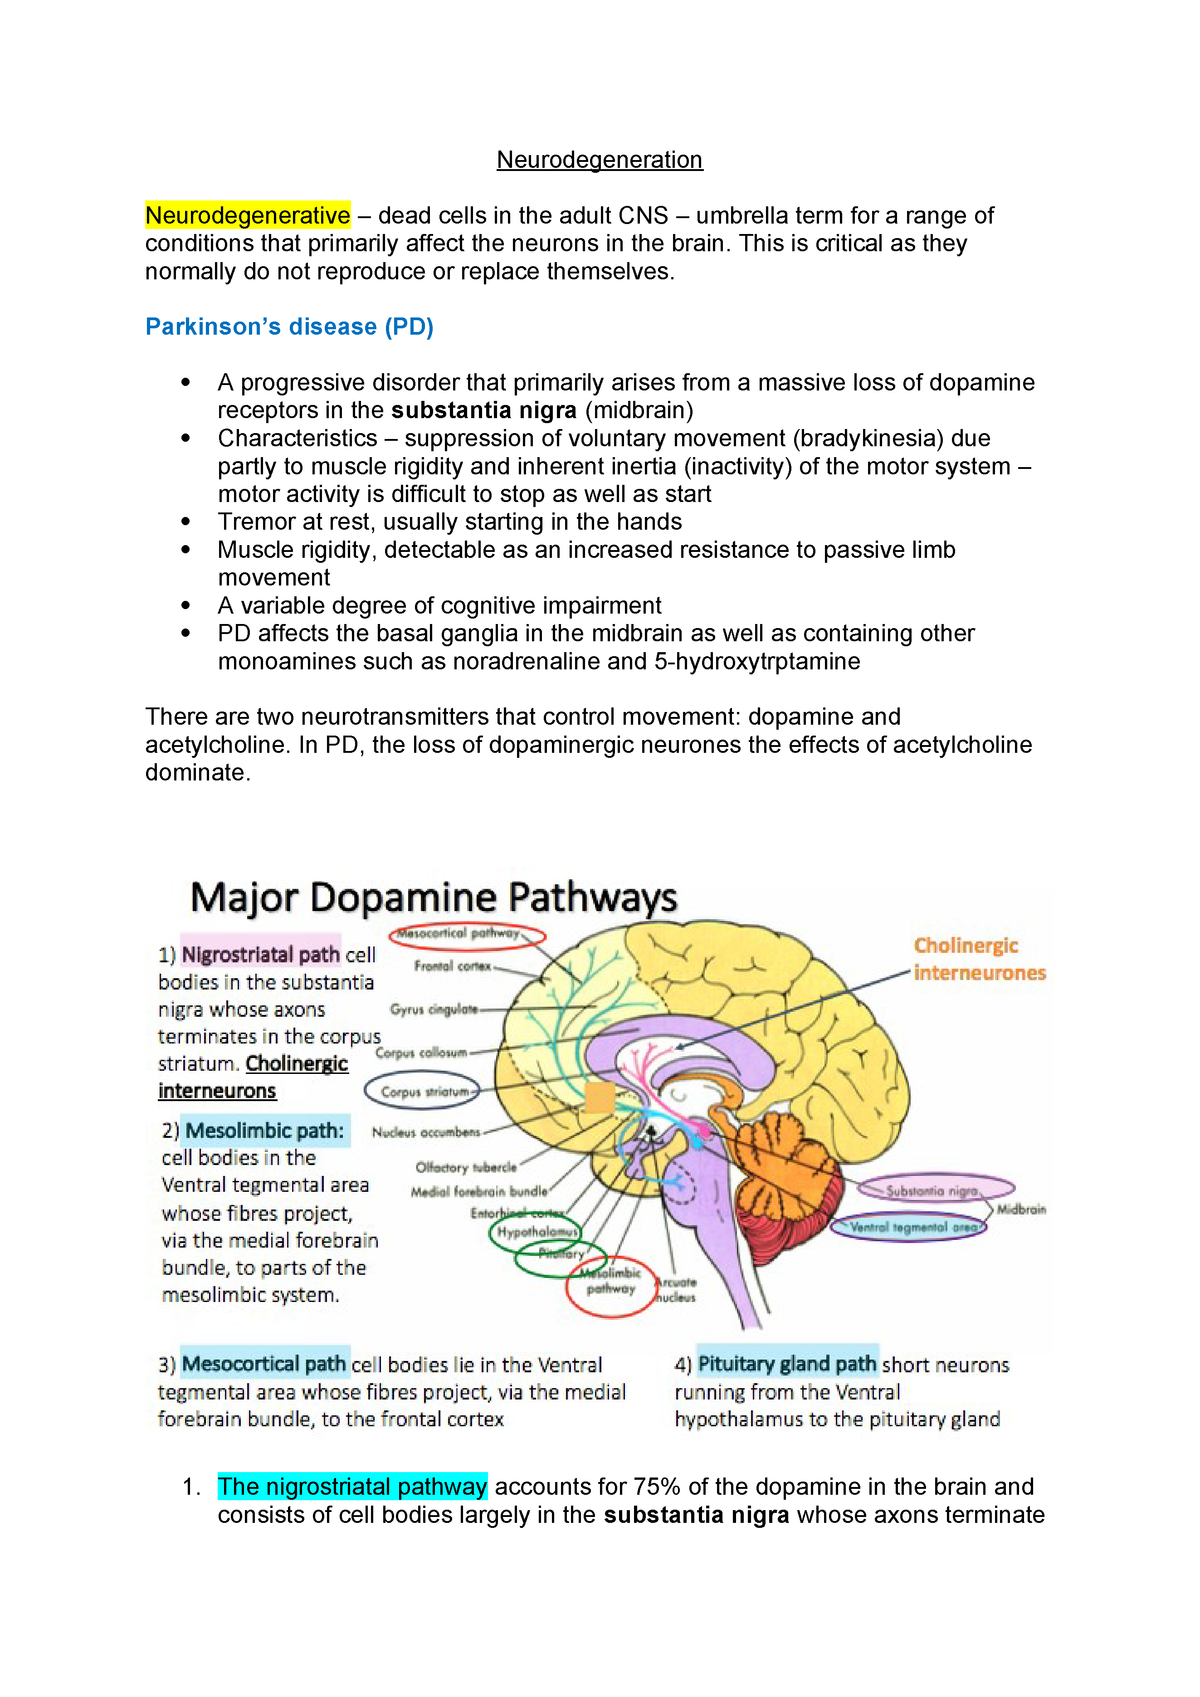 Neurodegeneration - Lecture notes 9 - BMD225 - QMUL - StuDocu